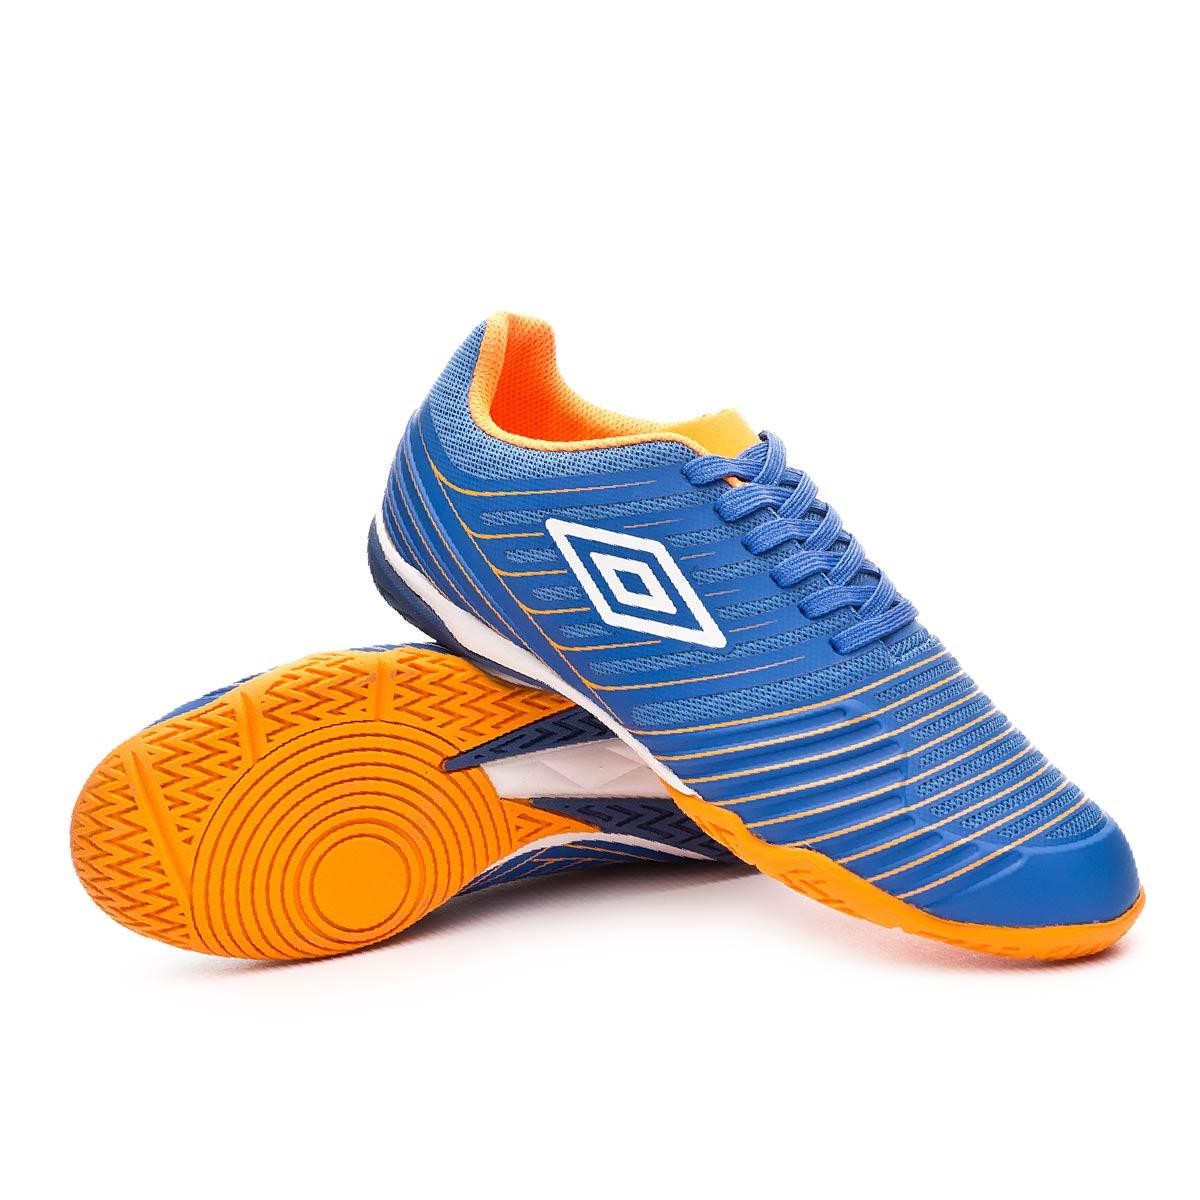 4cce5c1cf01be Futsal Boot Umbro New Vision Pro IC Royal-White-Turmeric - Football store  Fútbol Emotion